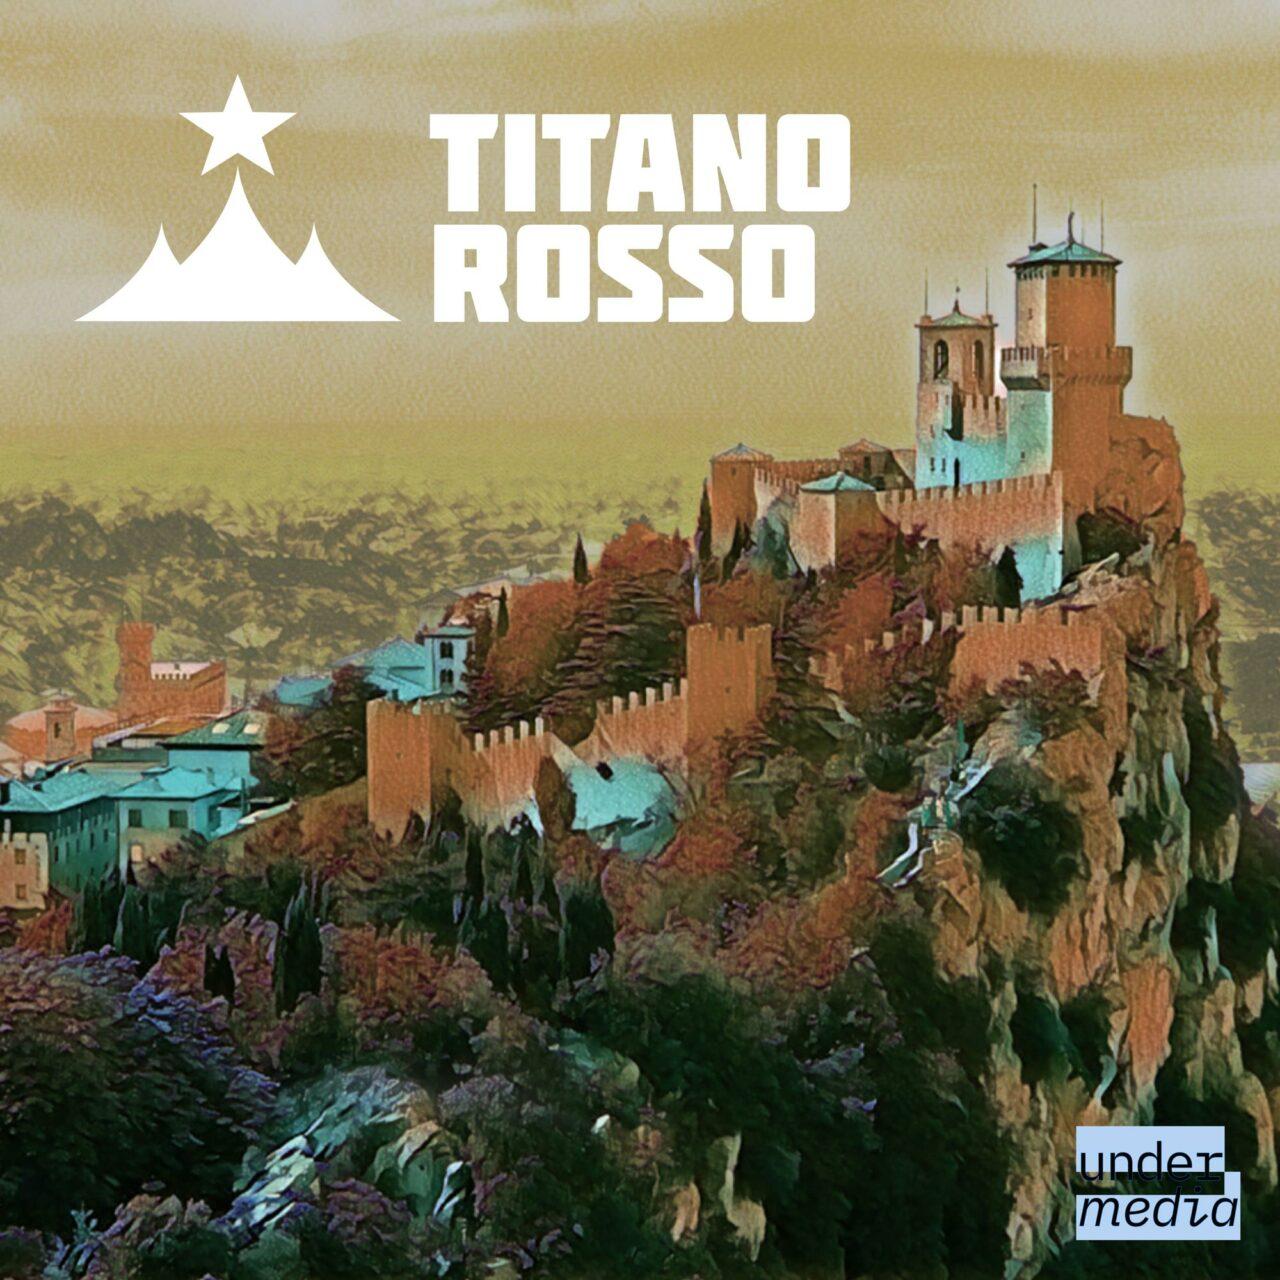 https://thesubmarine.it/wp-content/uploads/2021/05/titano-rosso-final-1280x1280.jpg